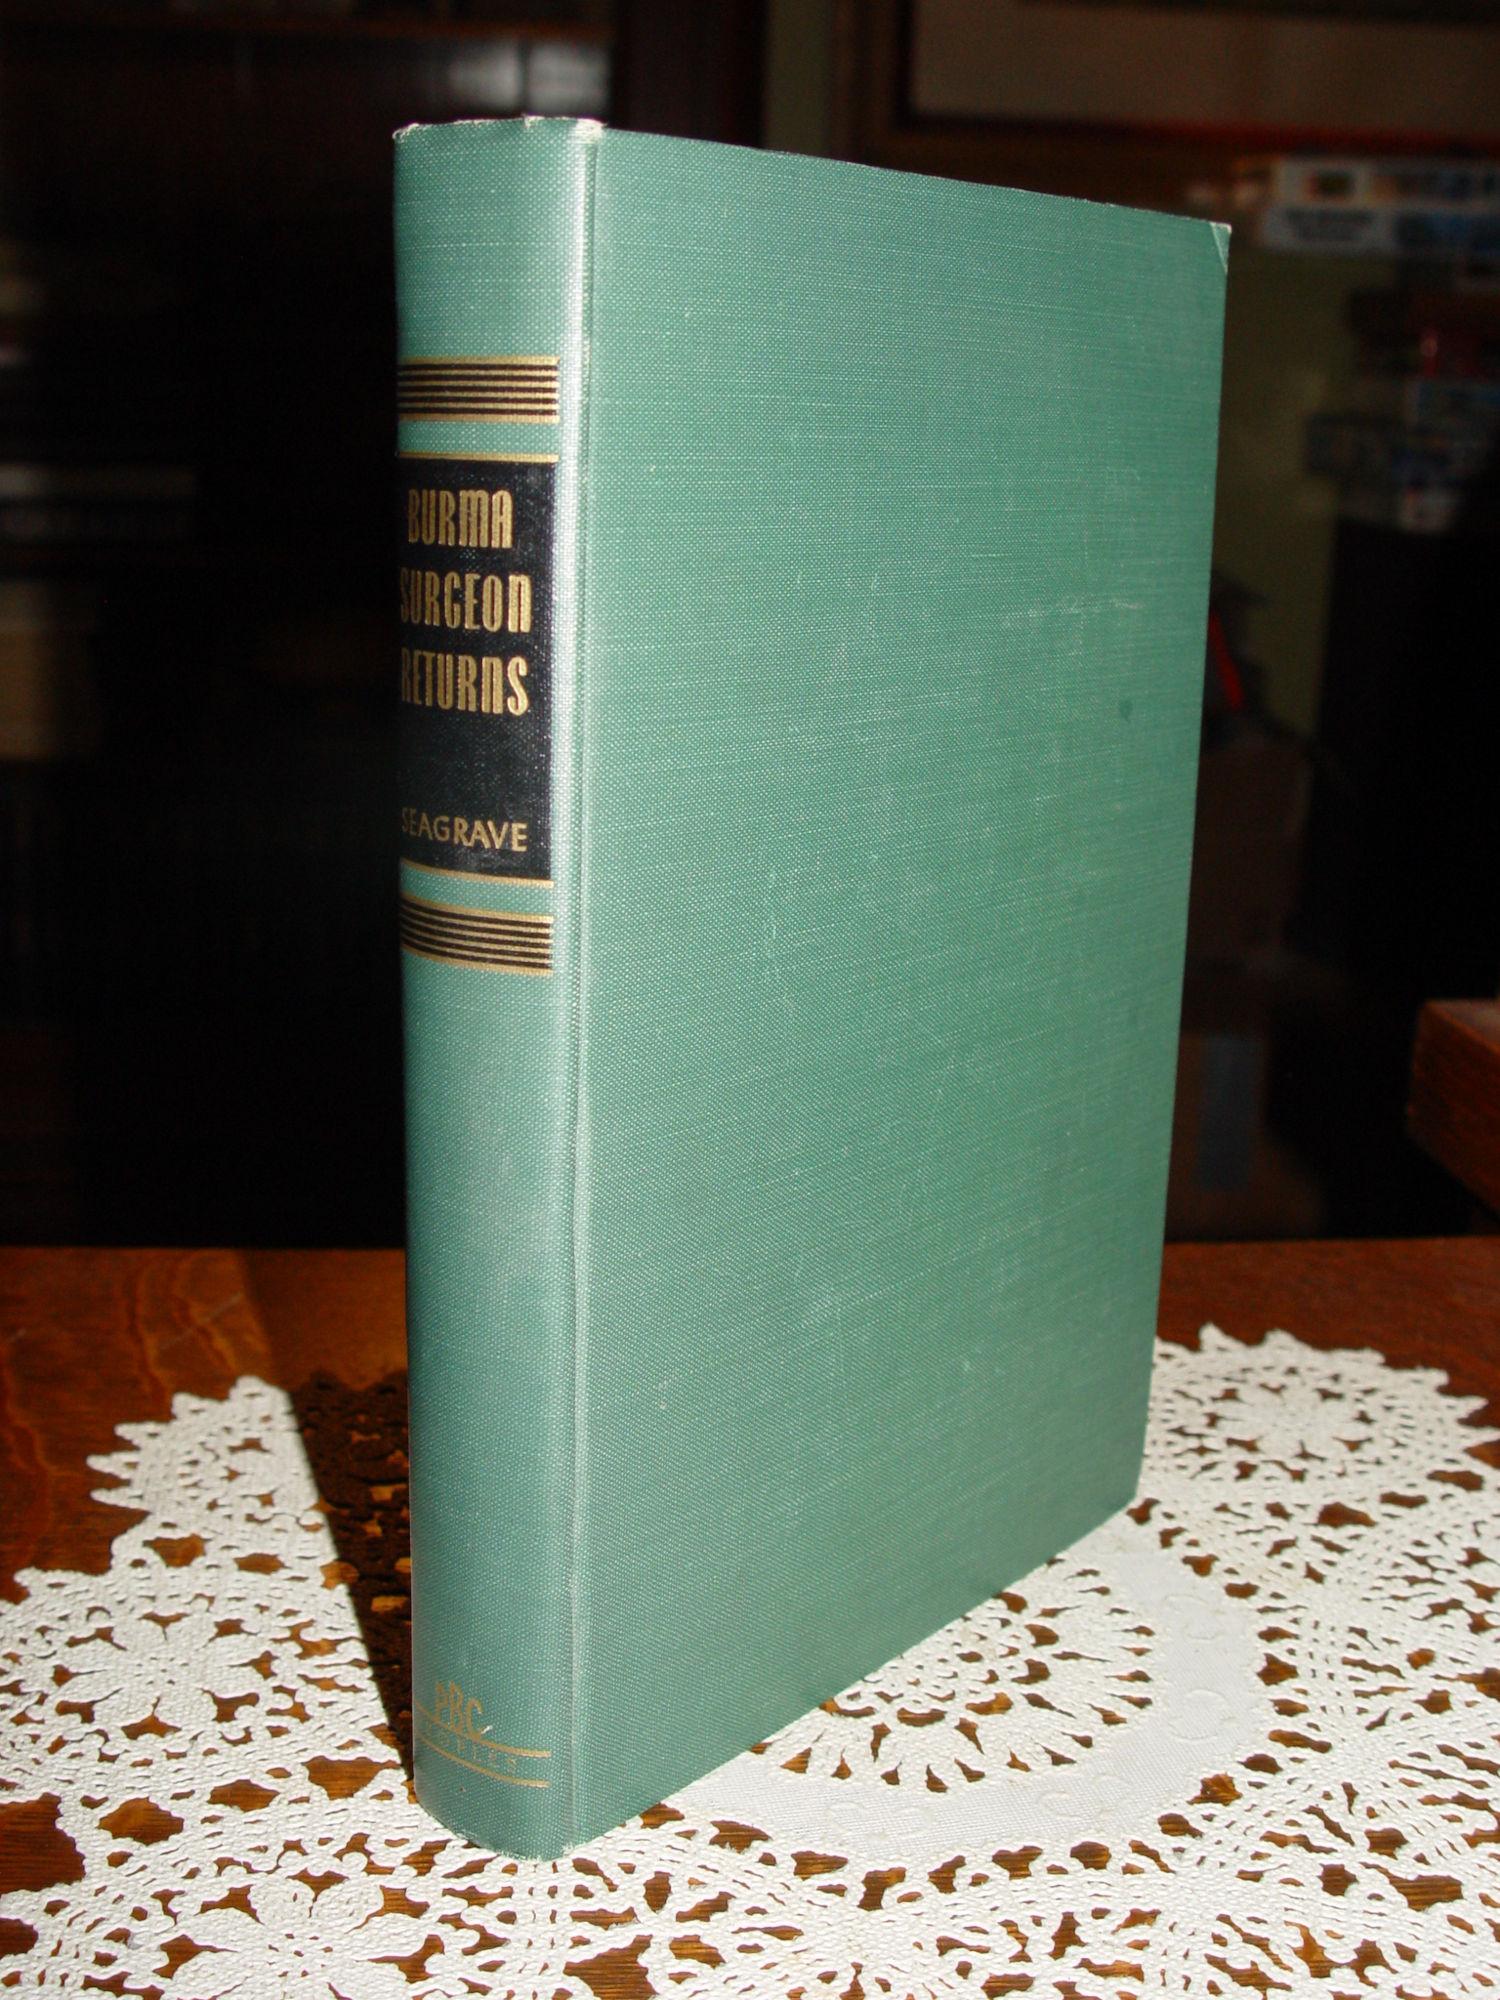 """Little Folk                                         Lyrics"" by Frank Dempster                                         Sherman 1897 Rare Antique book"